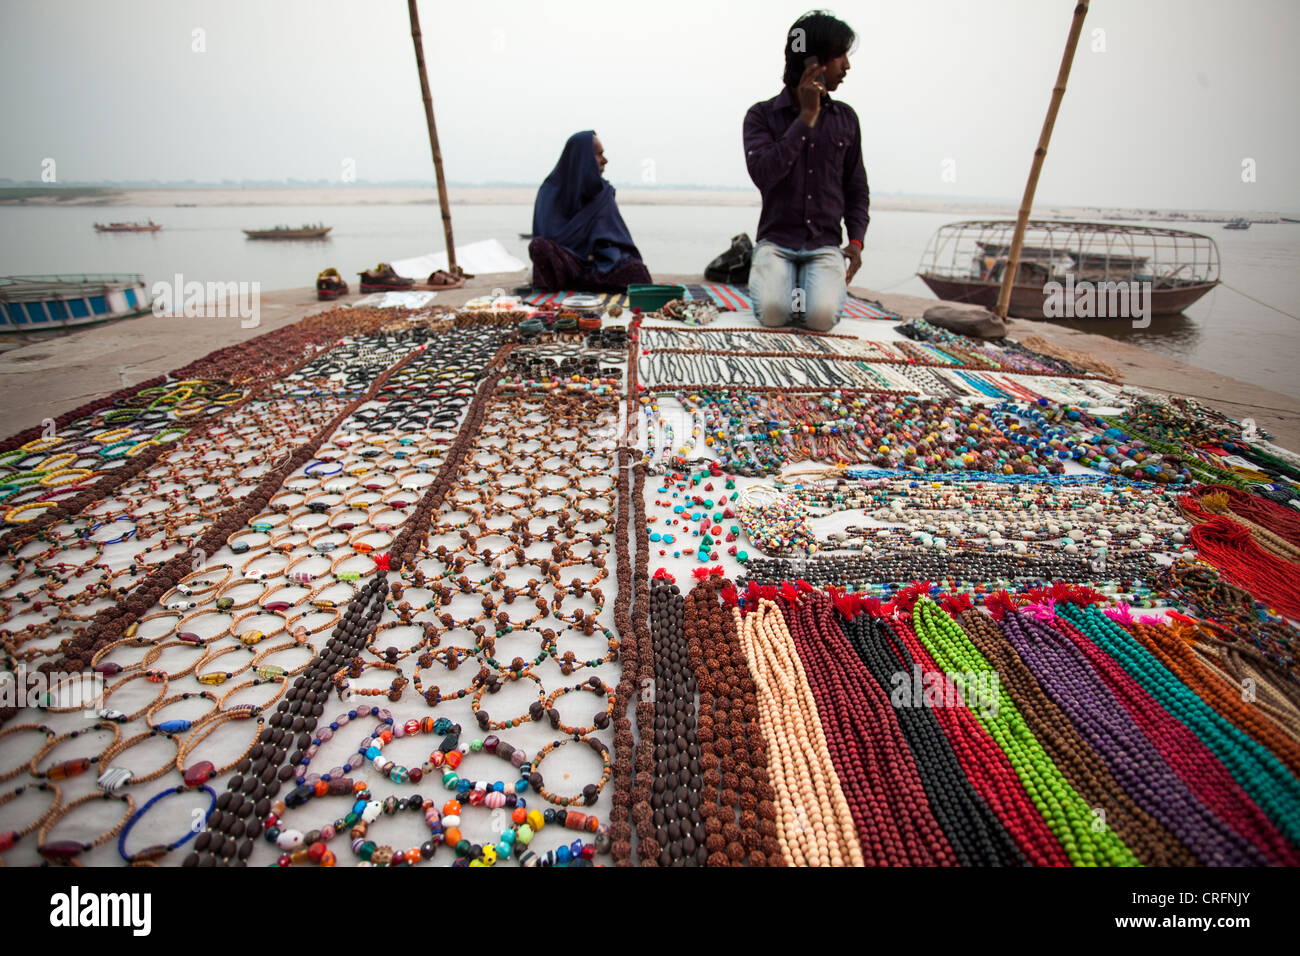 Accessory shop in Ghat in Varanasi, Uttar Pradesh, India - Stock Image